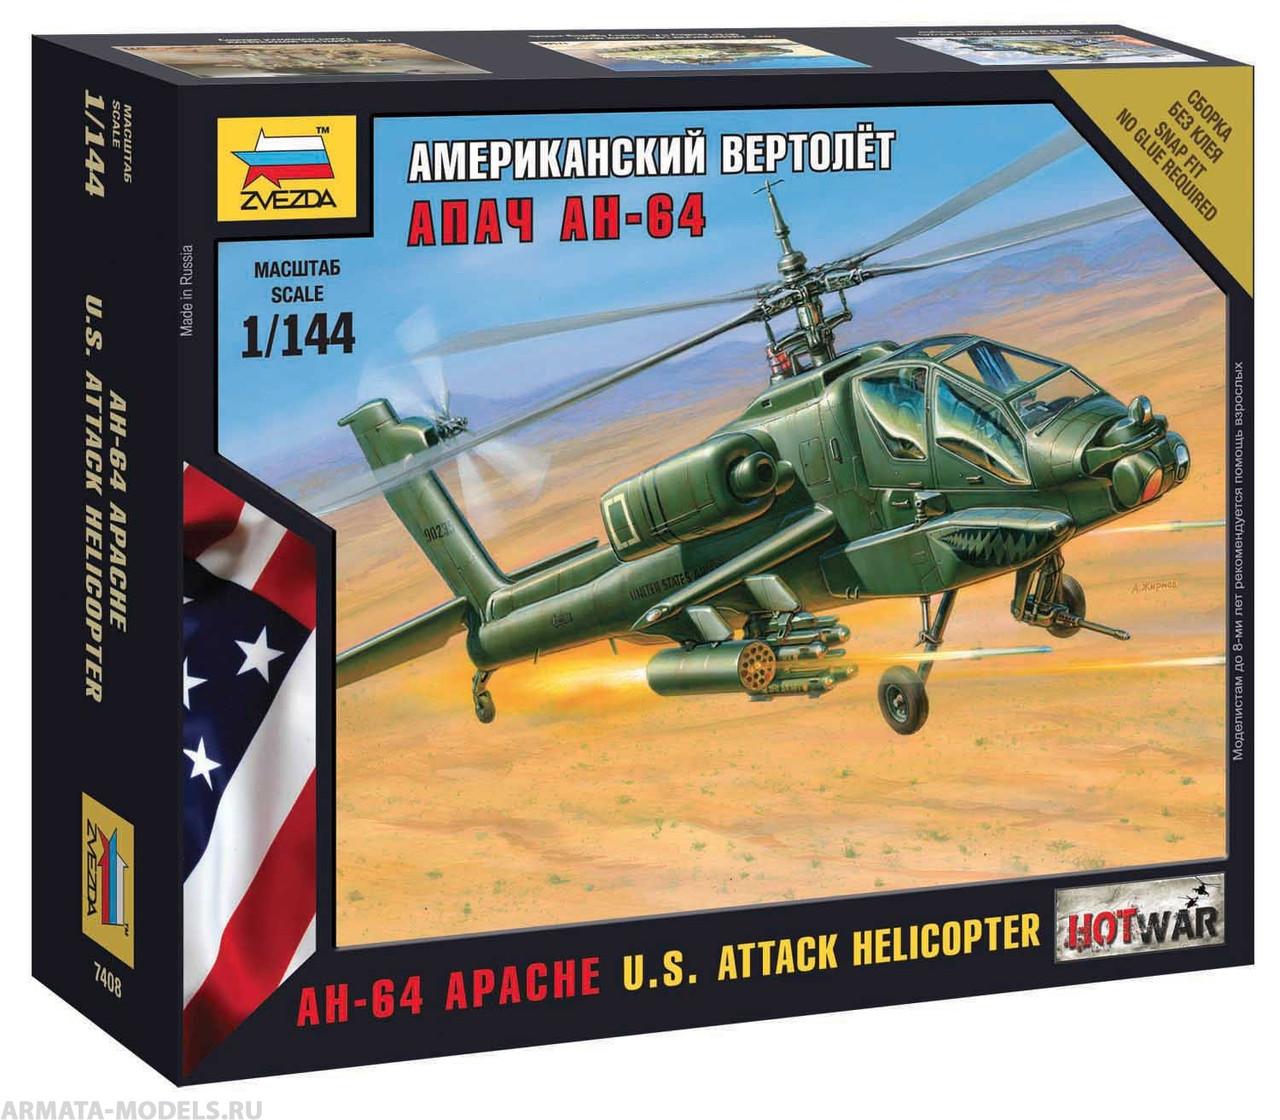 Апач АН-64 американский вертолет. 1/144 ZVEZDA 7408